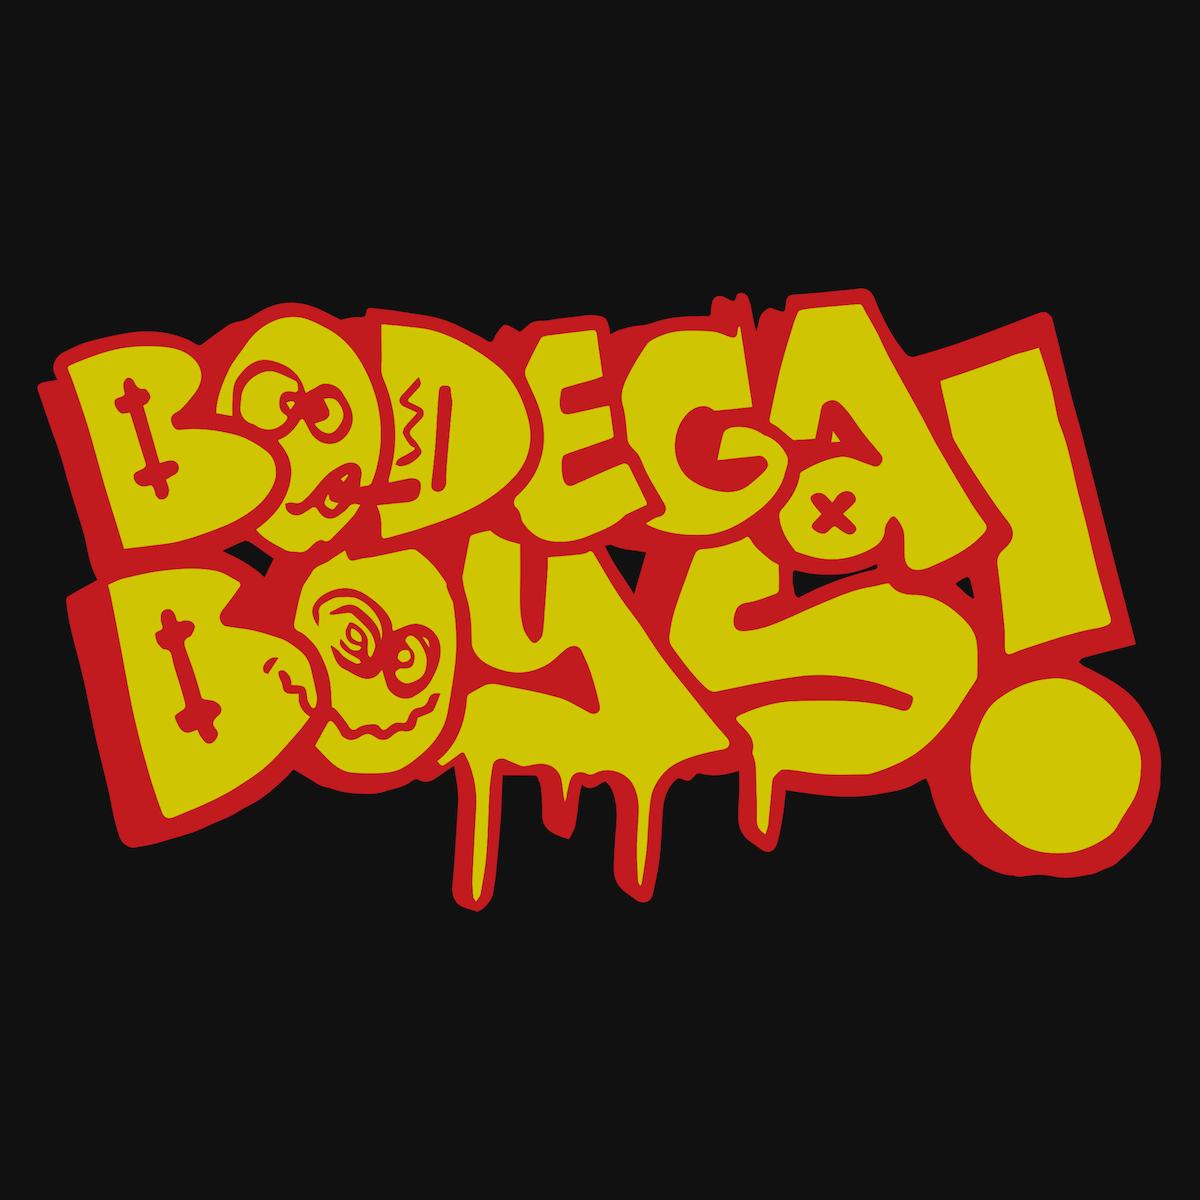 "Bodega Boys T-Shirt"" graphic tee by Bodega Boys  | Cotton Bureau"